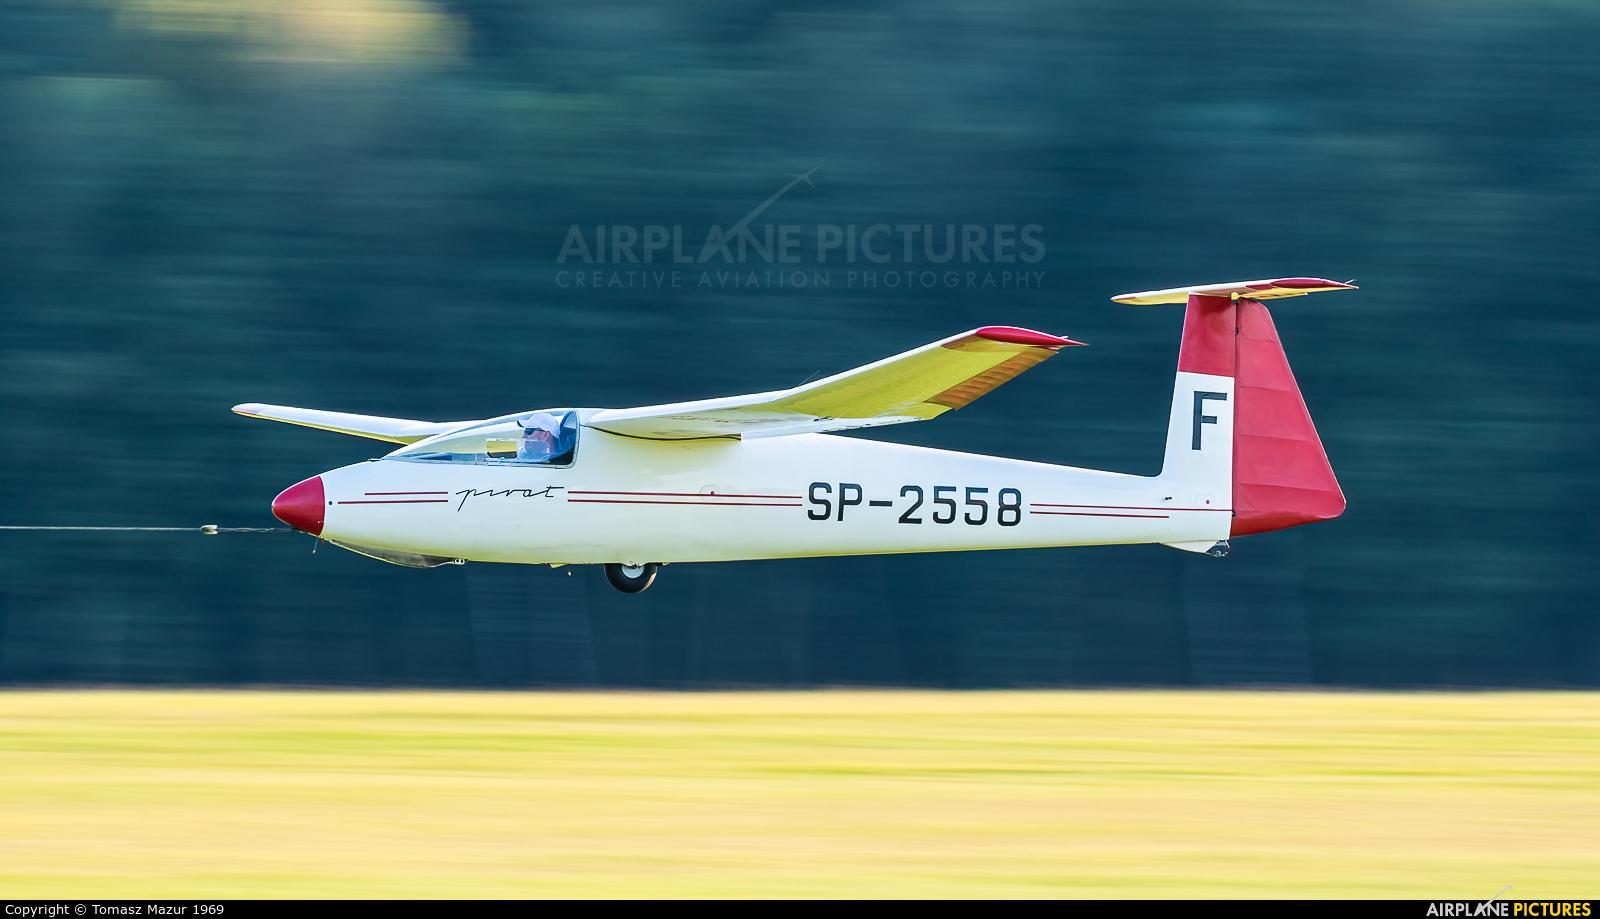 Aeroclub ROW SP-2558 aircraft at Rybnik - Gotartowice